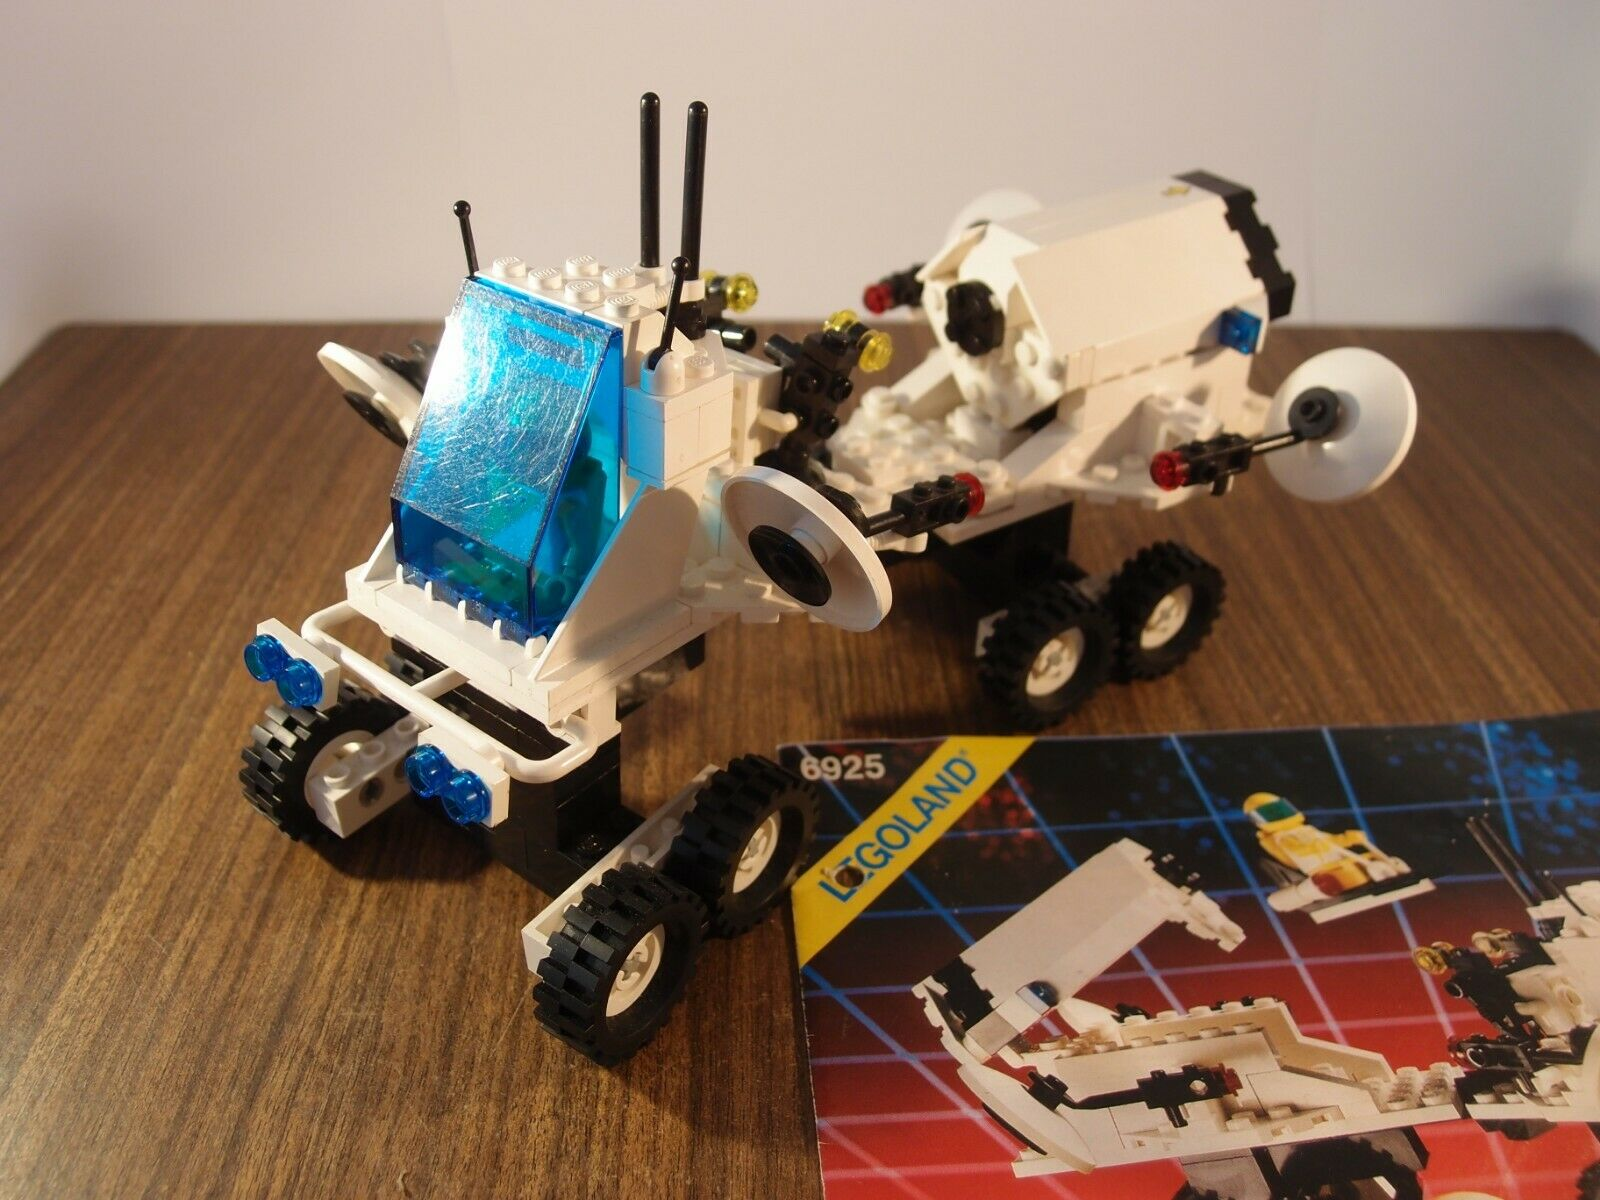 1988 Lego Group Vintage Lego 6925 espacio  futuron  interplanetario Rover